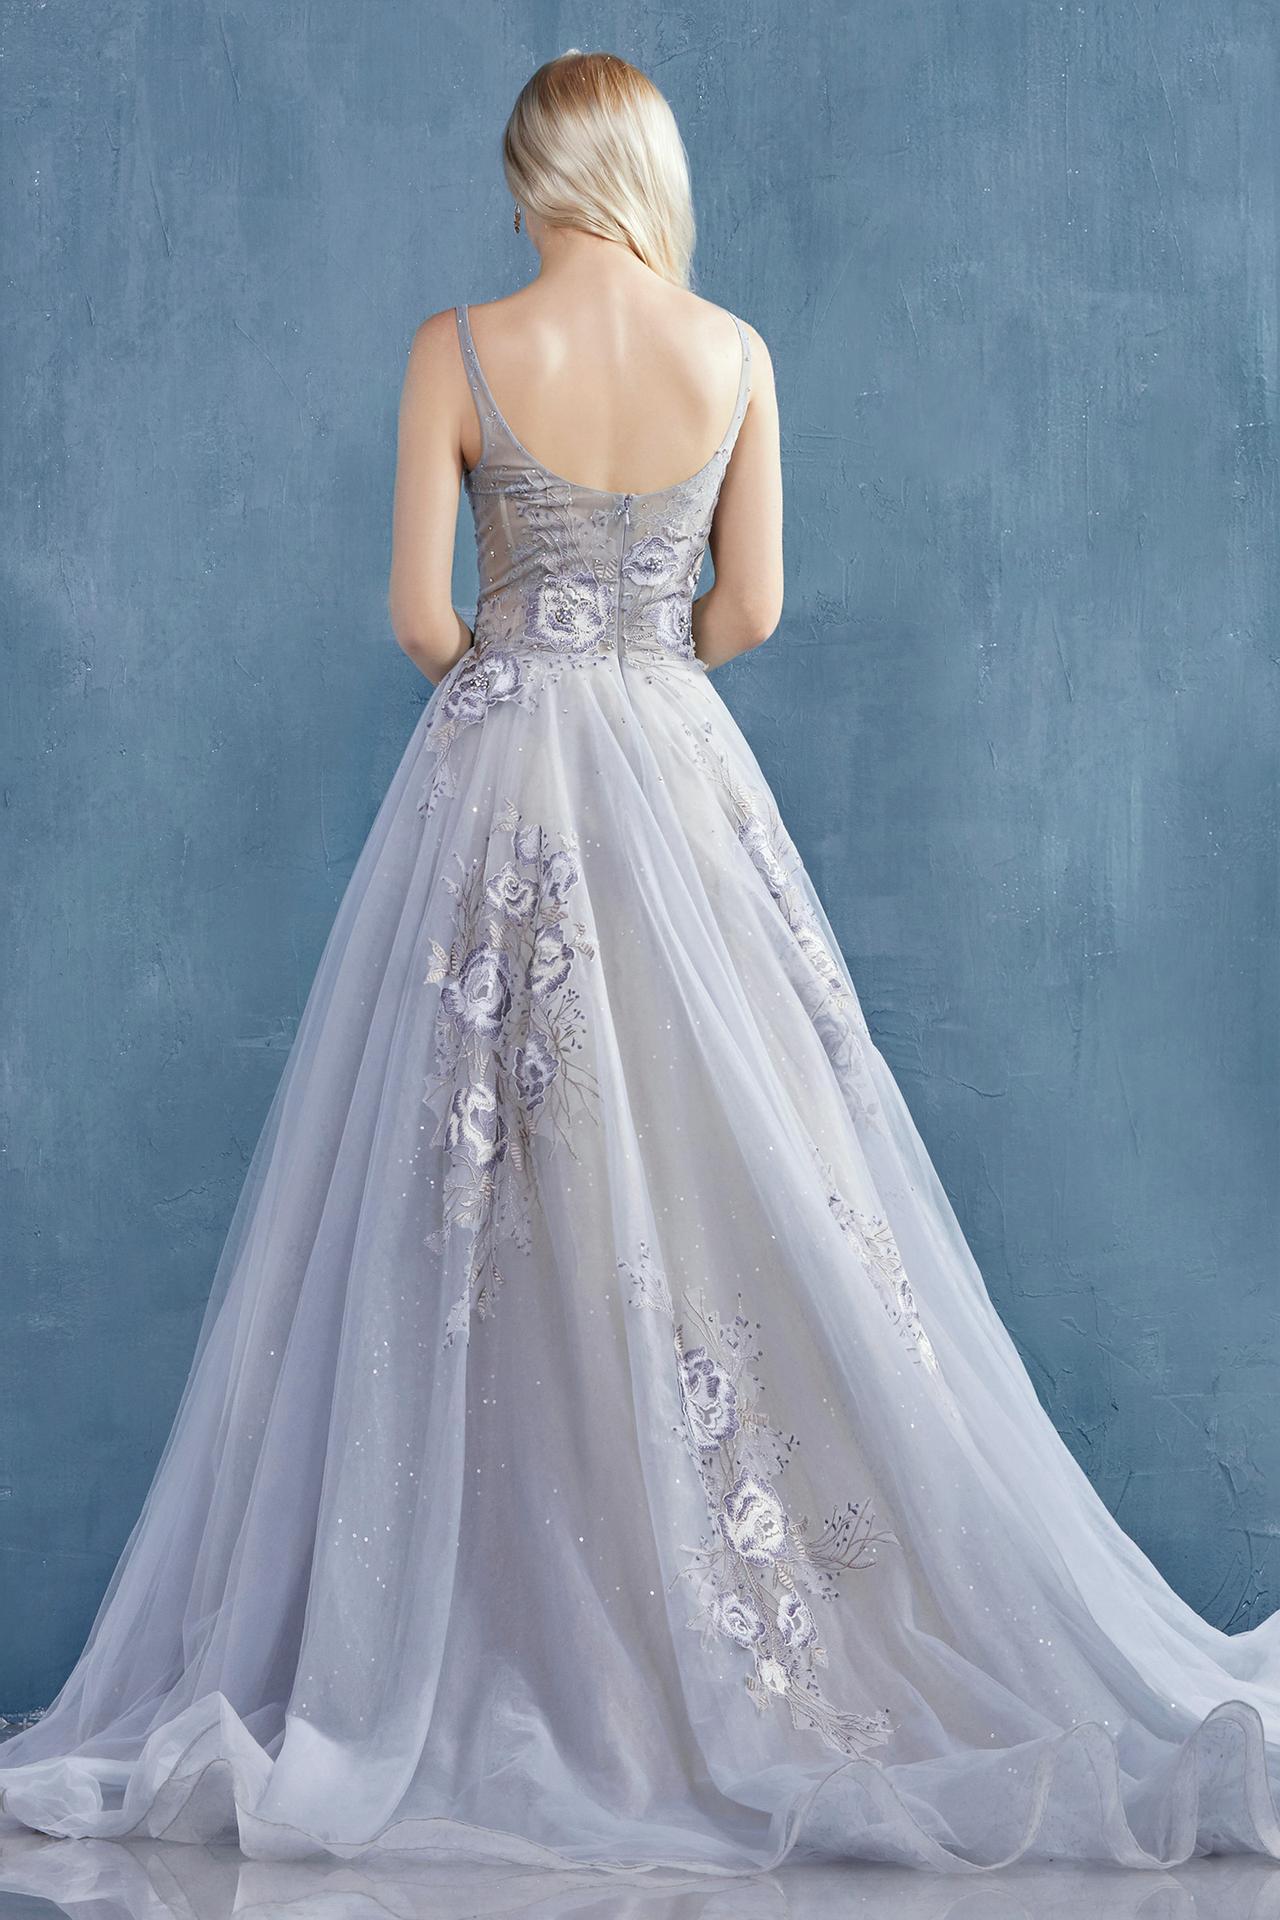 Nové spoločenské šaty :) - Obrázok č. 58